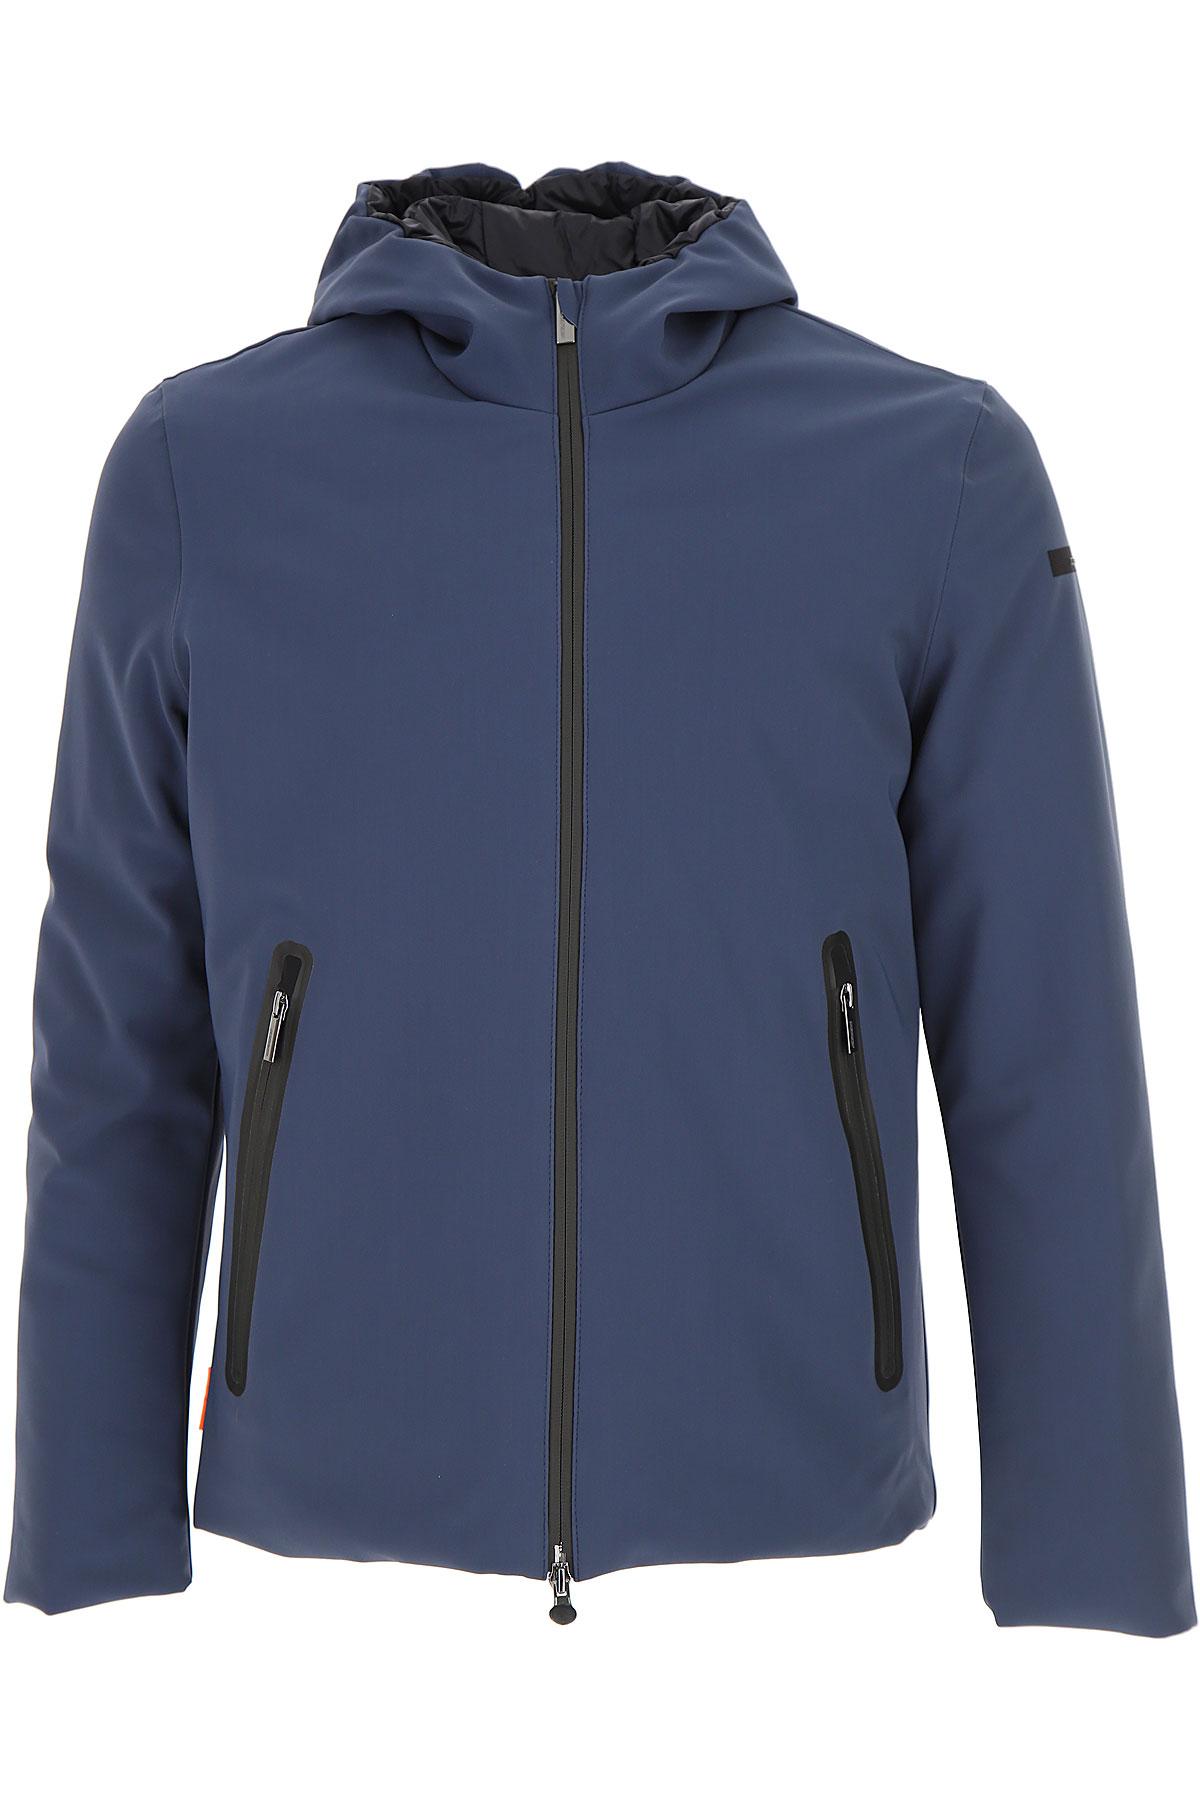 Image of RRD Down Jacket for Men, Puffer Ski Jacket, Avio Blue, polyester, 2017, L M XL